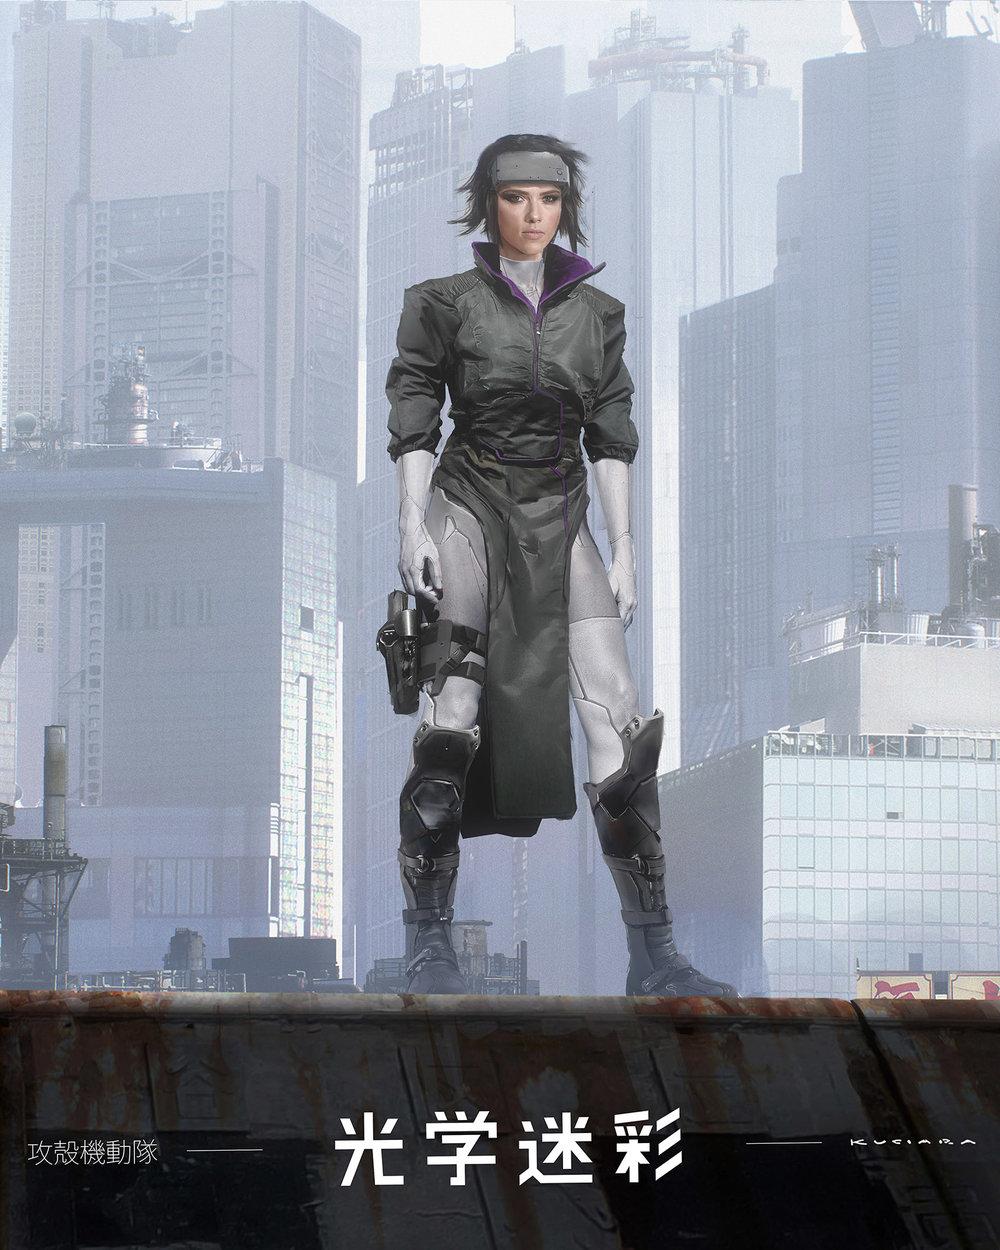 GITS_MajorThermoOptical+Tactical_MK_071315_v03.jpg